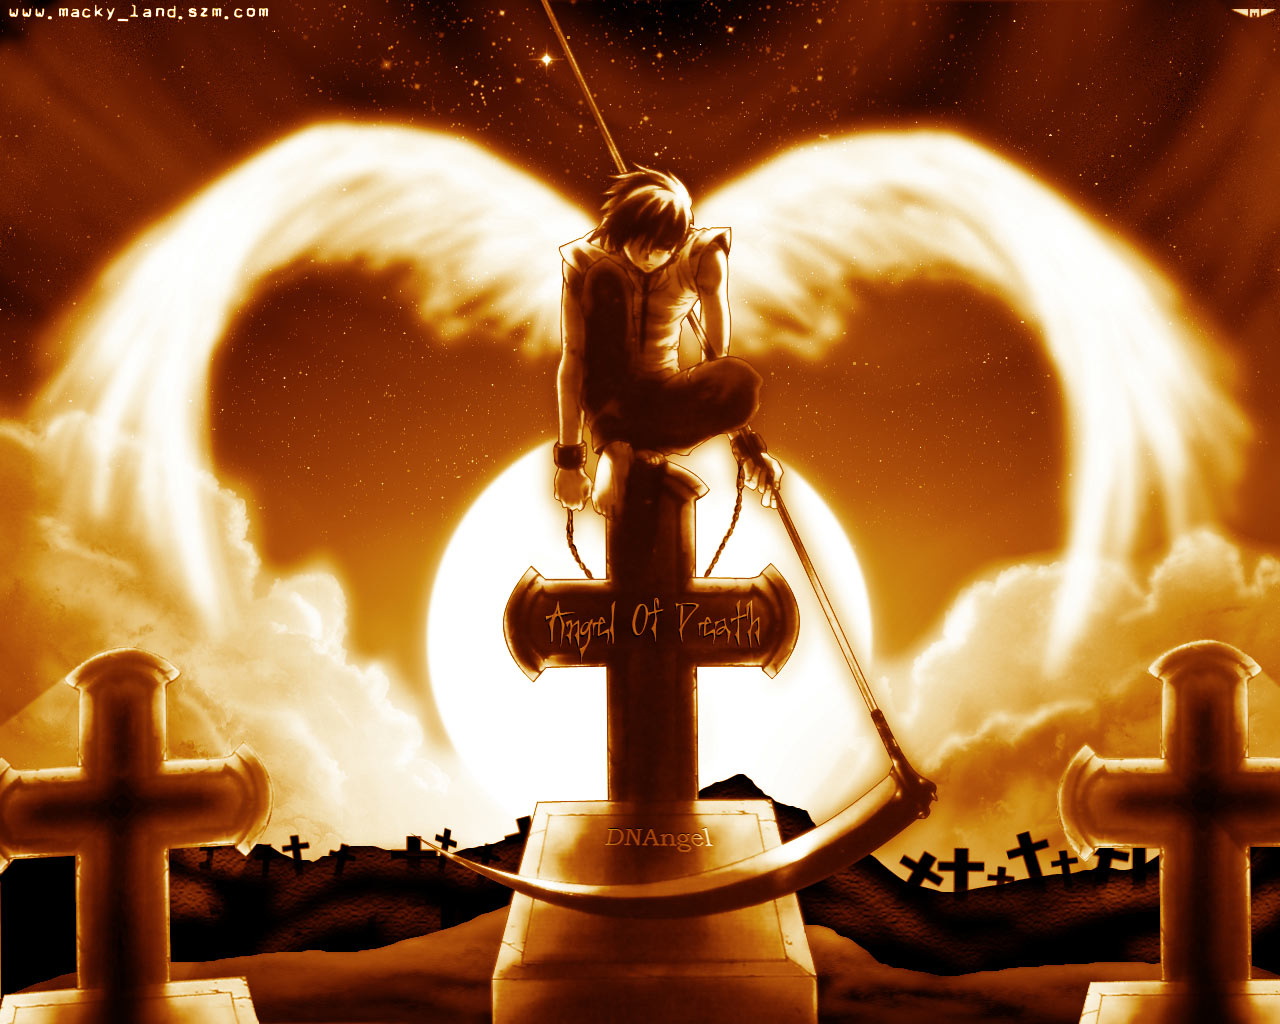 https://4.bp.blogspot.com/-QAppFYxt5yg/TjmrKGv-mgI/AAAAAAAABpo/bAfkefDG1Xk/s1600/Anime+angel+of+death+wallpaper+1.jpg